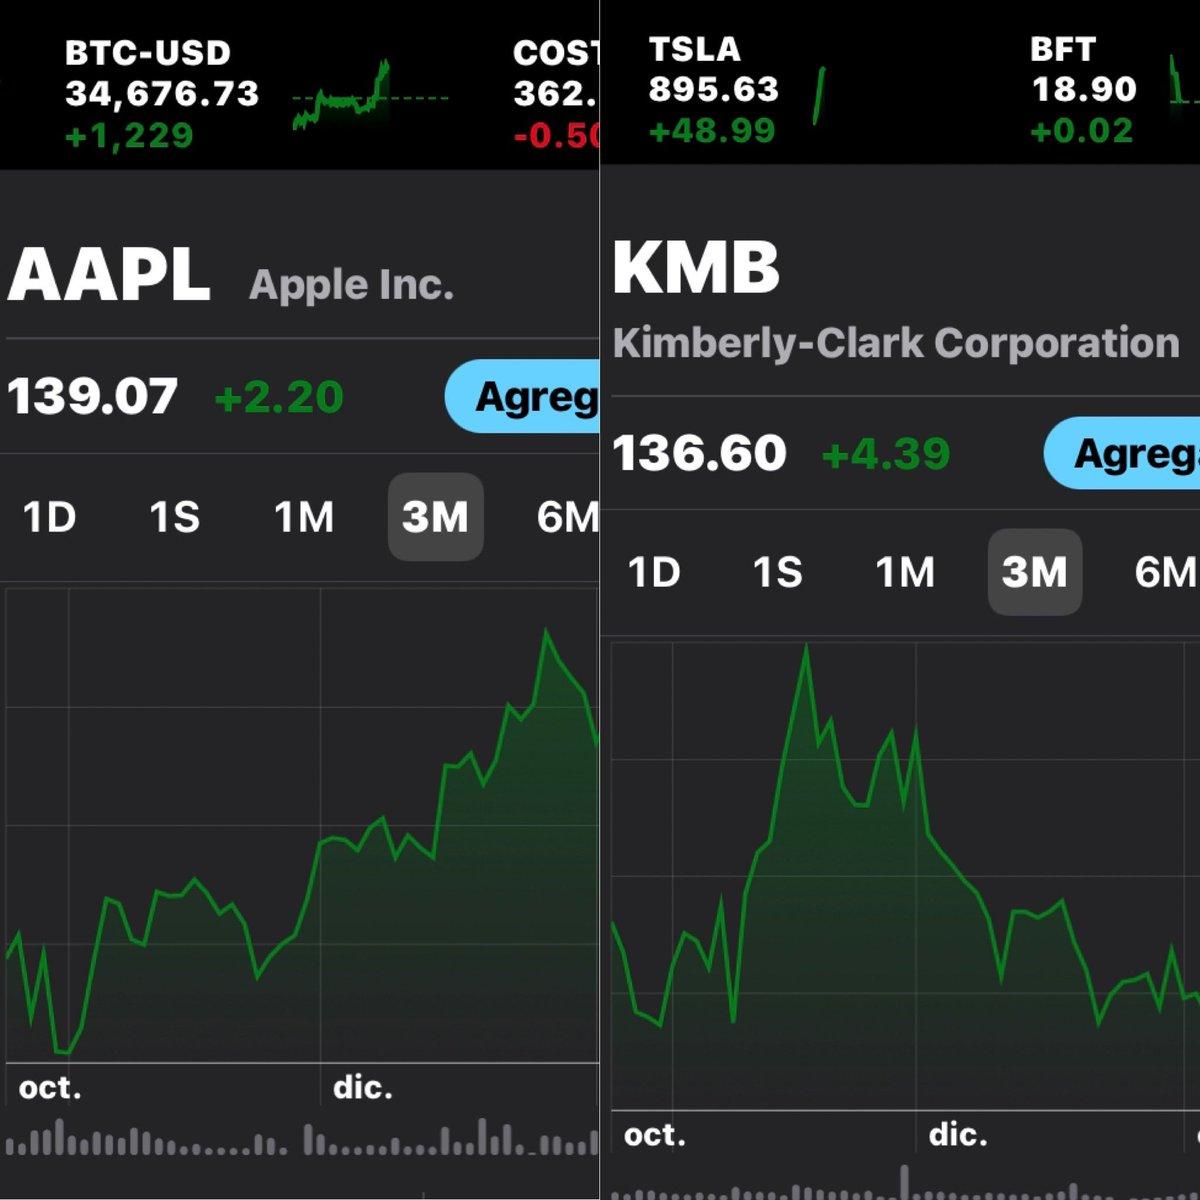 "25jan2021 @jimcramer #StopTrading #alerts "" $AAPL upgrade & $KMB report great quartr"" #aapl #kmb #apple #kimberlyclark #sp500 #spy #dia #DowJones #nasdaq #nyse #stockmarket #trade #shares #cramer #trading #investing #etf #acciones #valores #bolsa #stock #symbol #market #mercado"